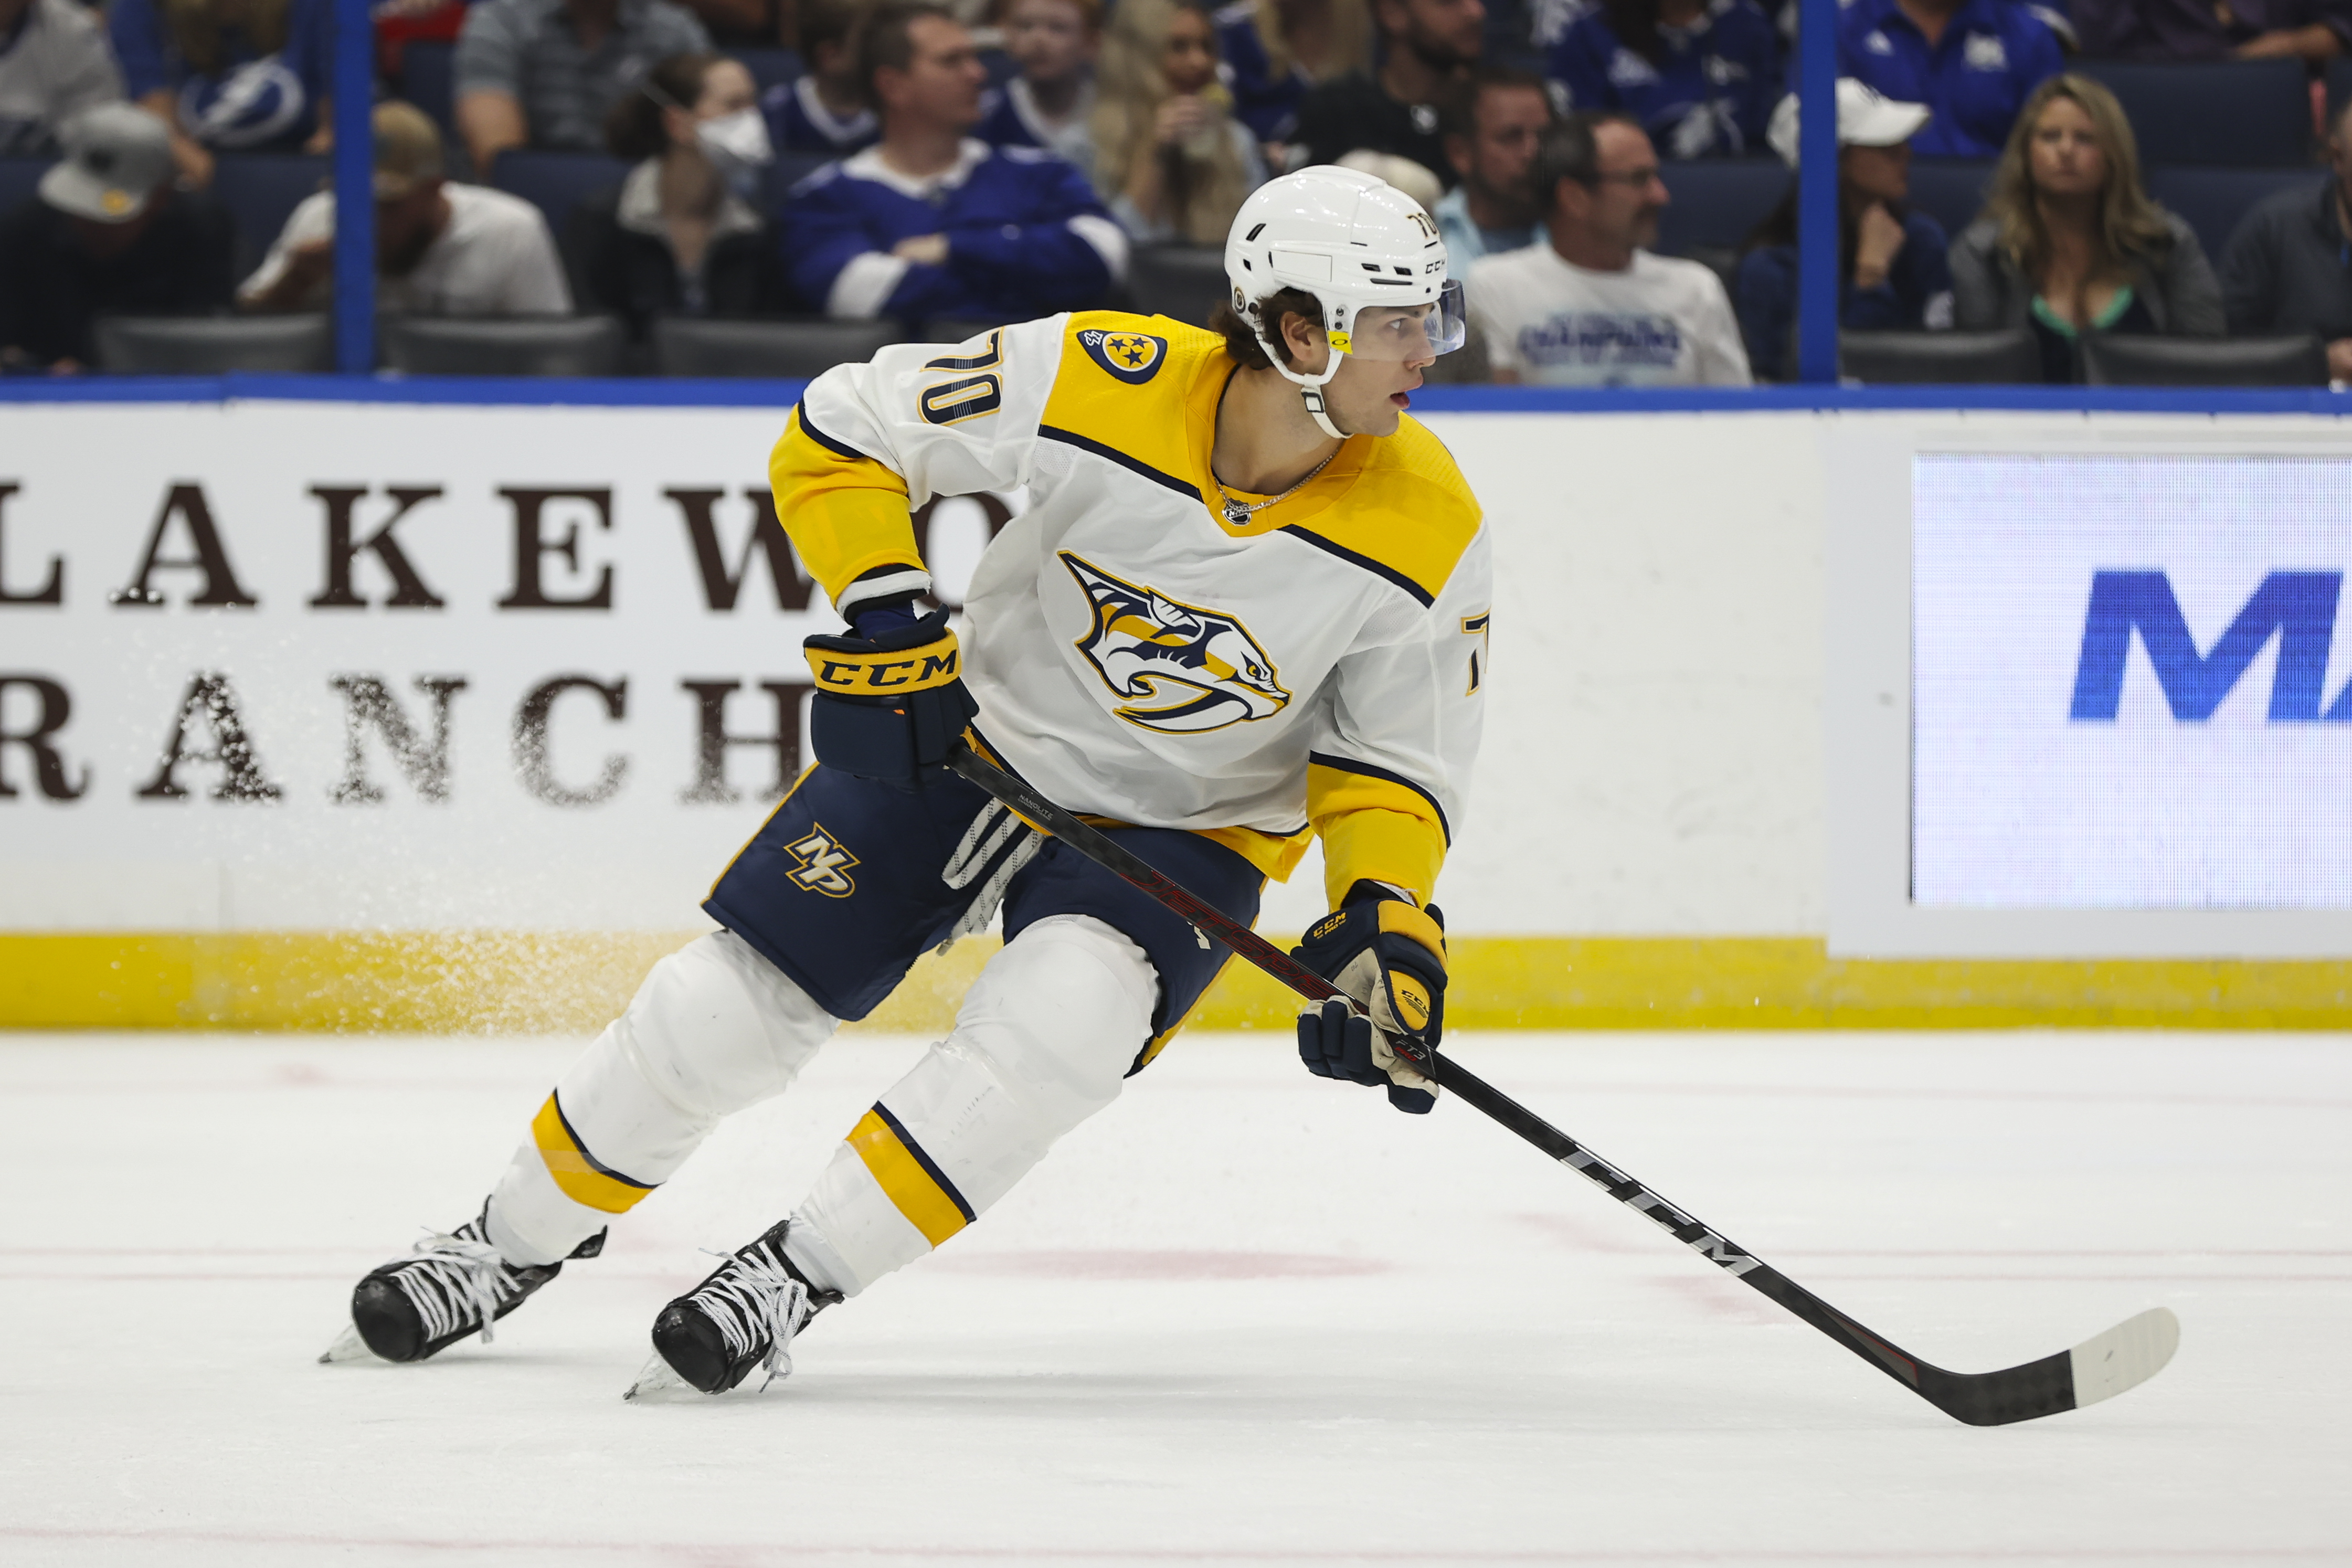 NHL: SEP 30 Preseason - Predators at Lightning